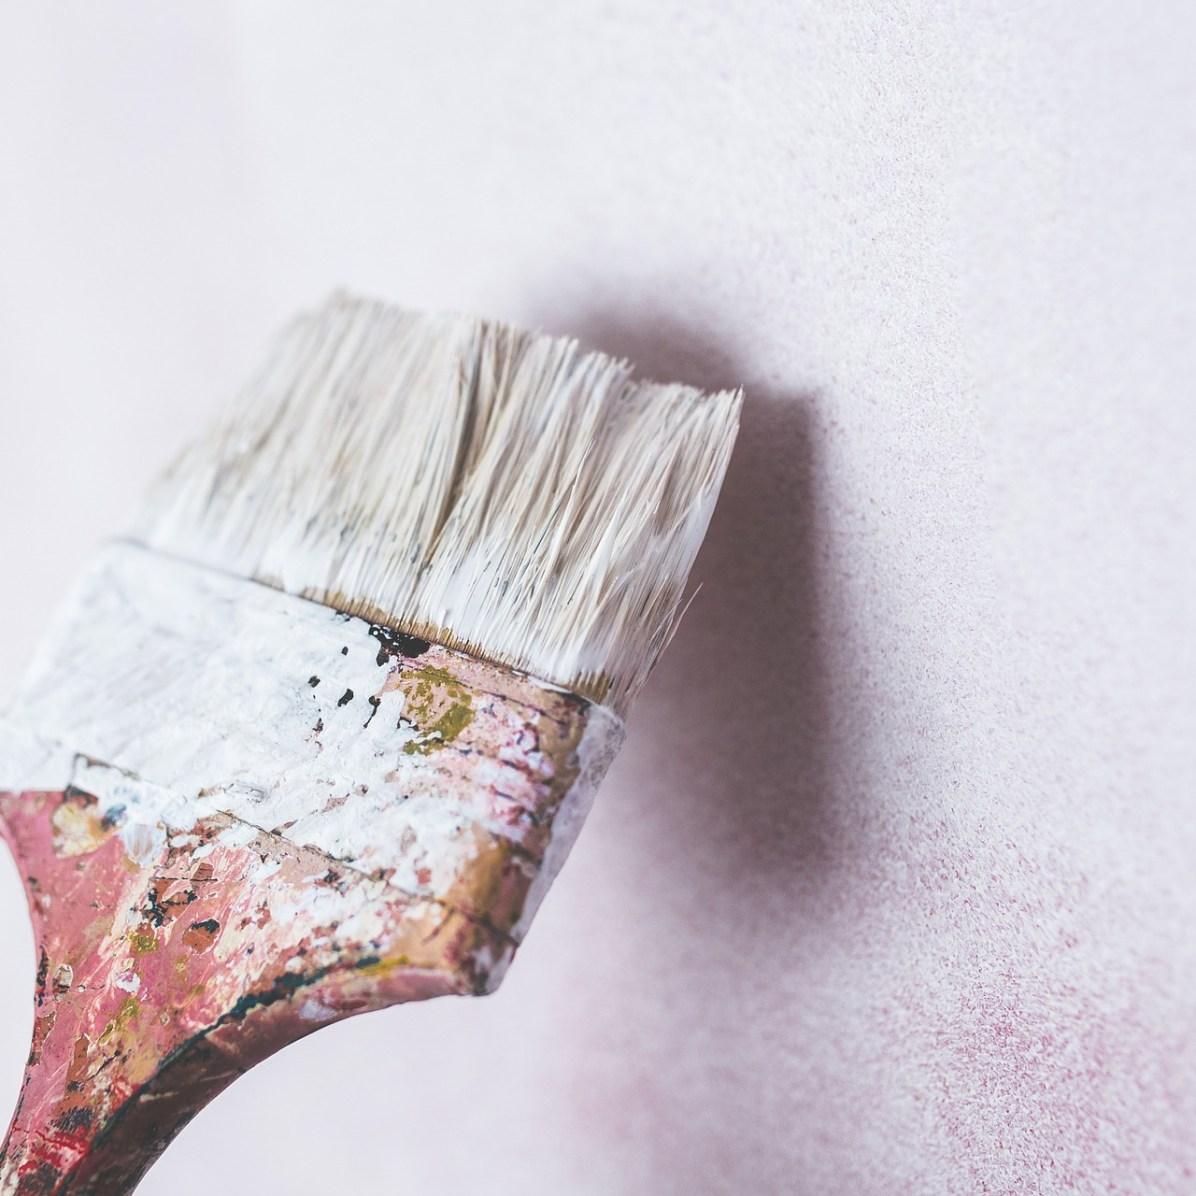 HIRING: Building Maintenance